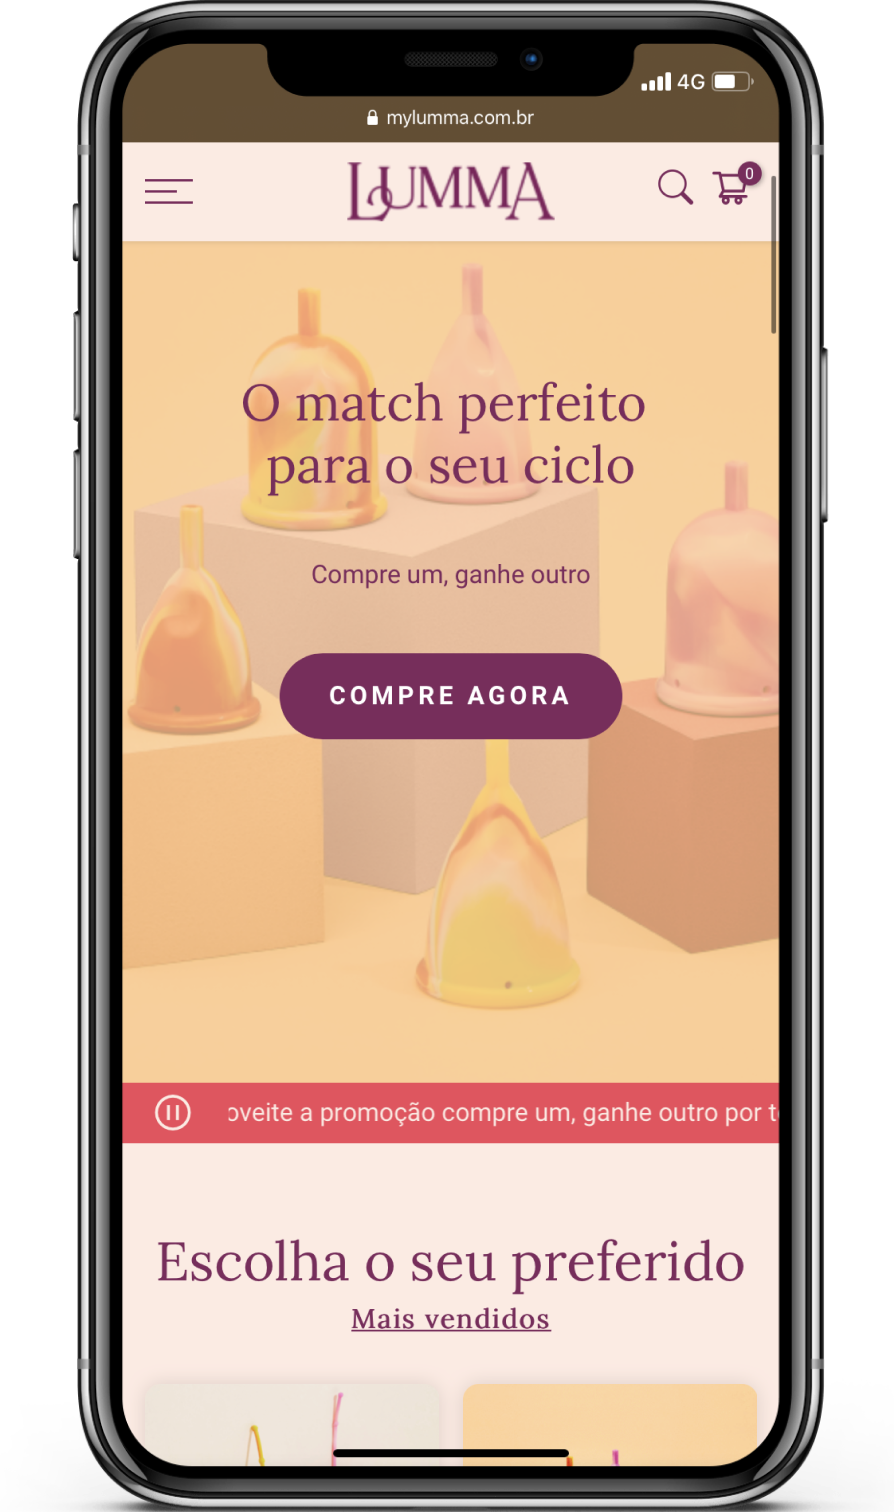 mylumma.com.br